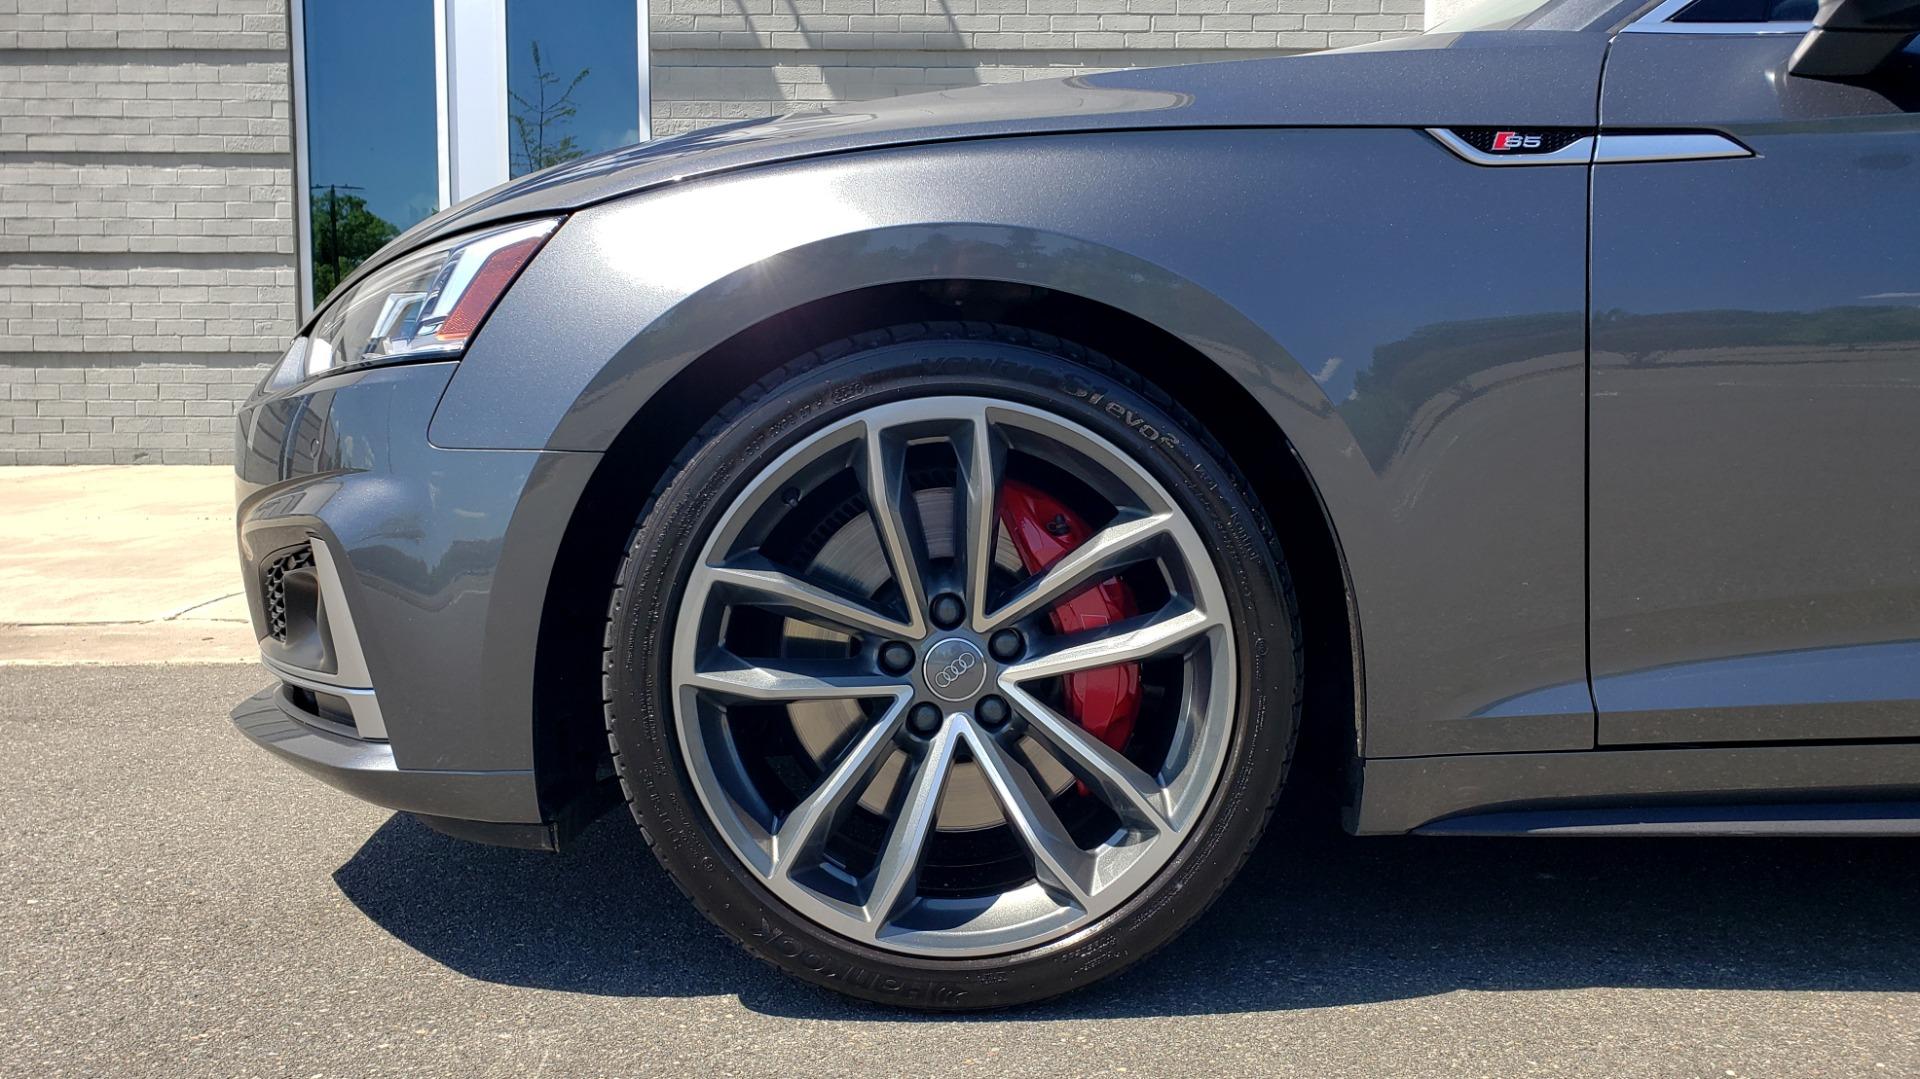 Used 2018 Audi S5 SPORTBACK PRESTIGE S-SPORT / NAV / SUNROOF / HUD / B&O SND / REARVIEW for sale $48,995 at Formula Imports in Charlotte NC 28227 72